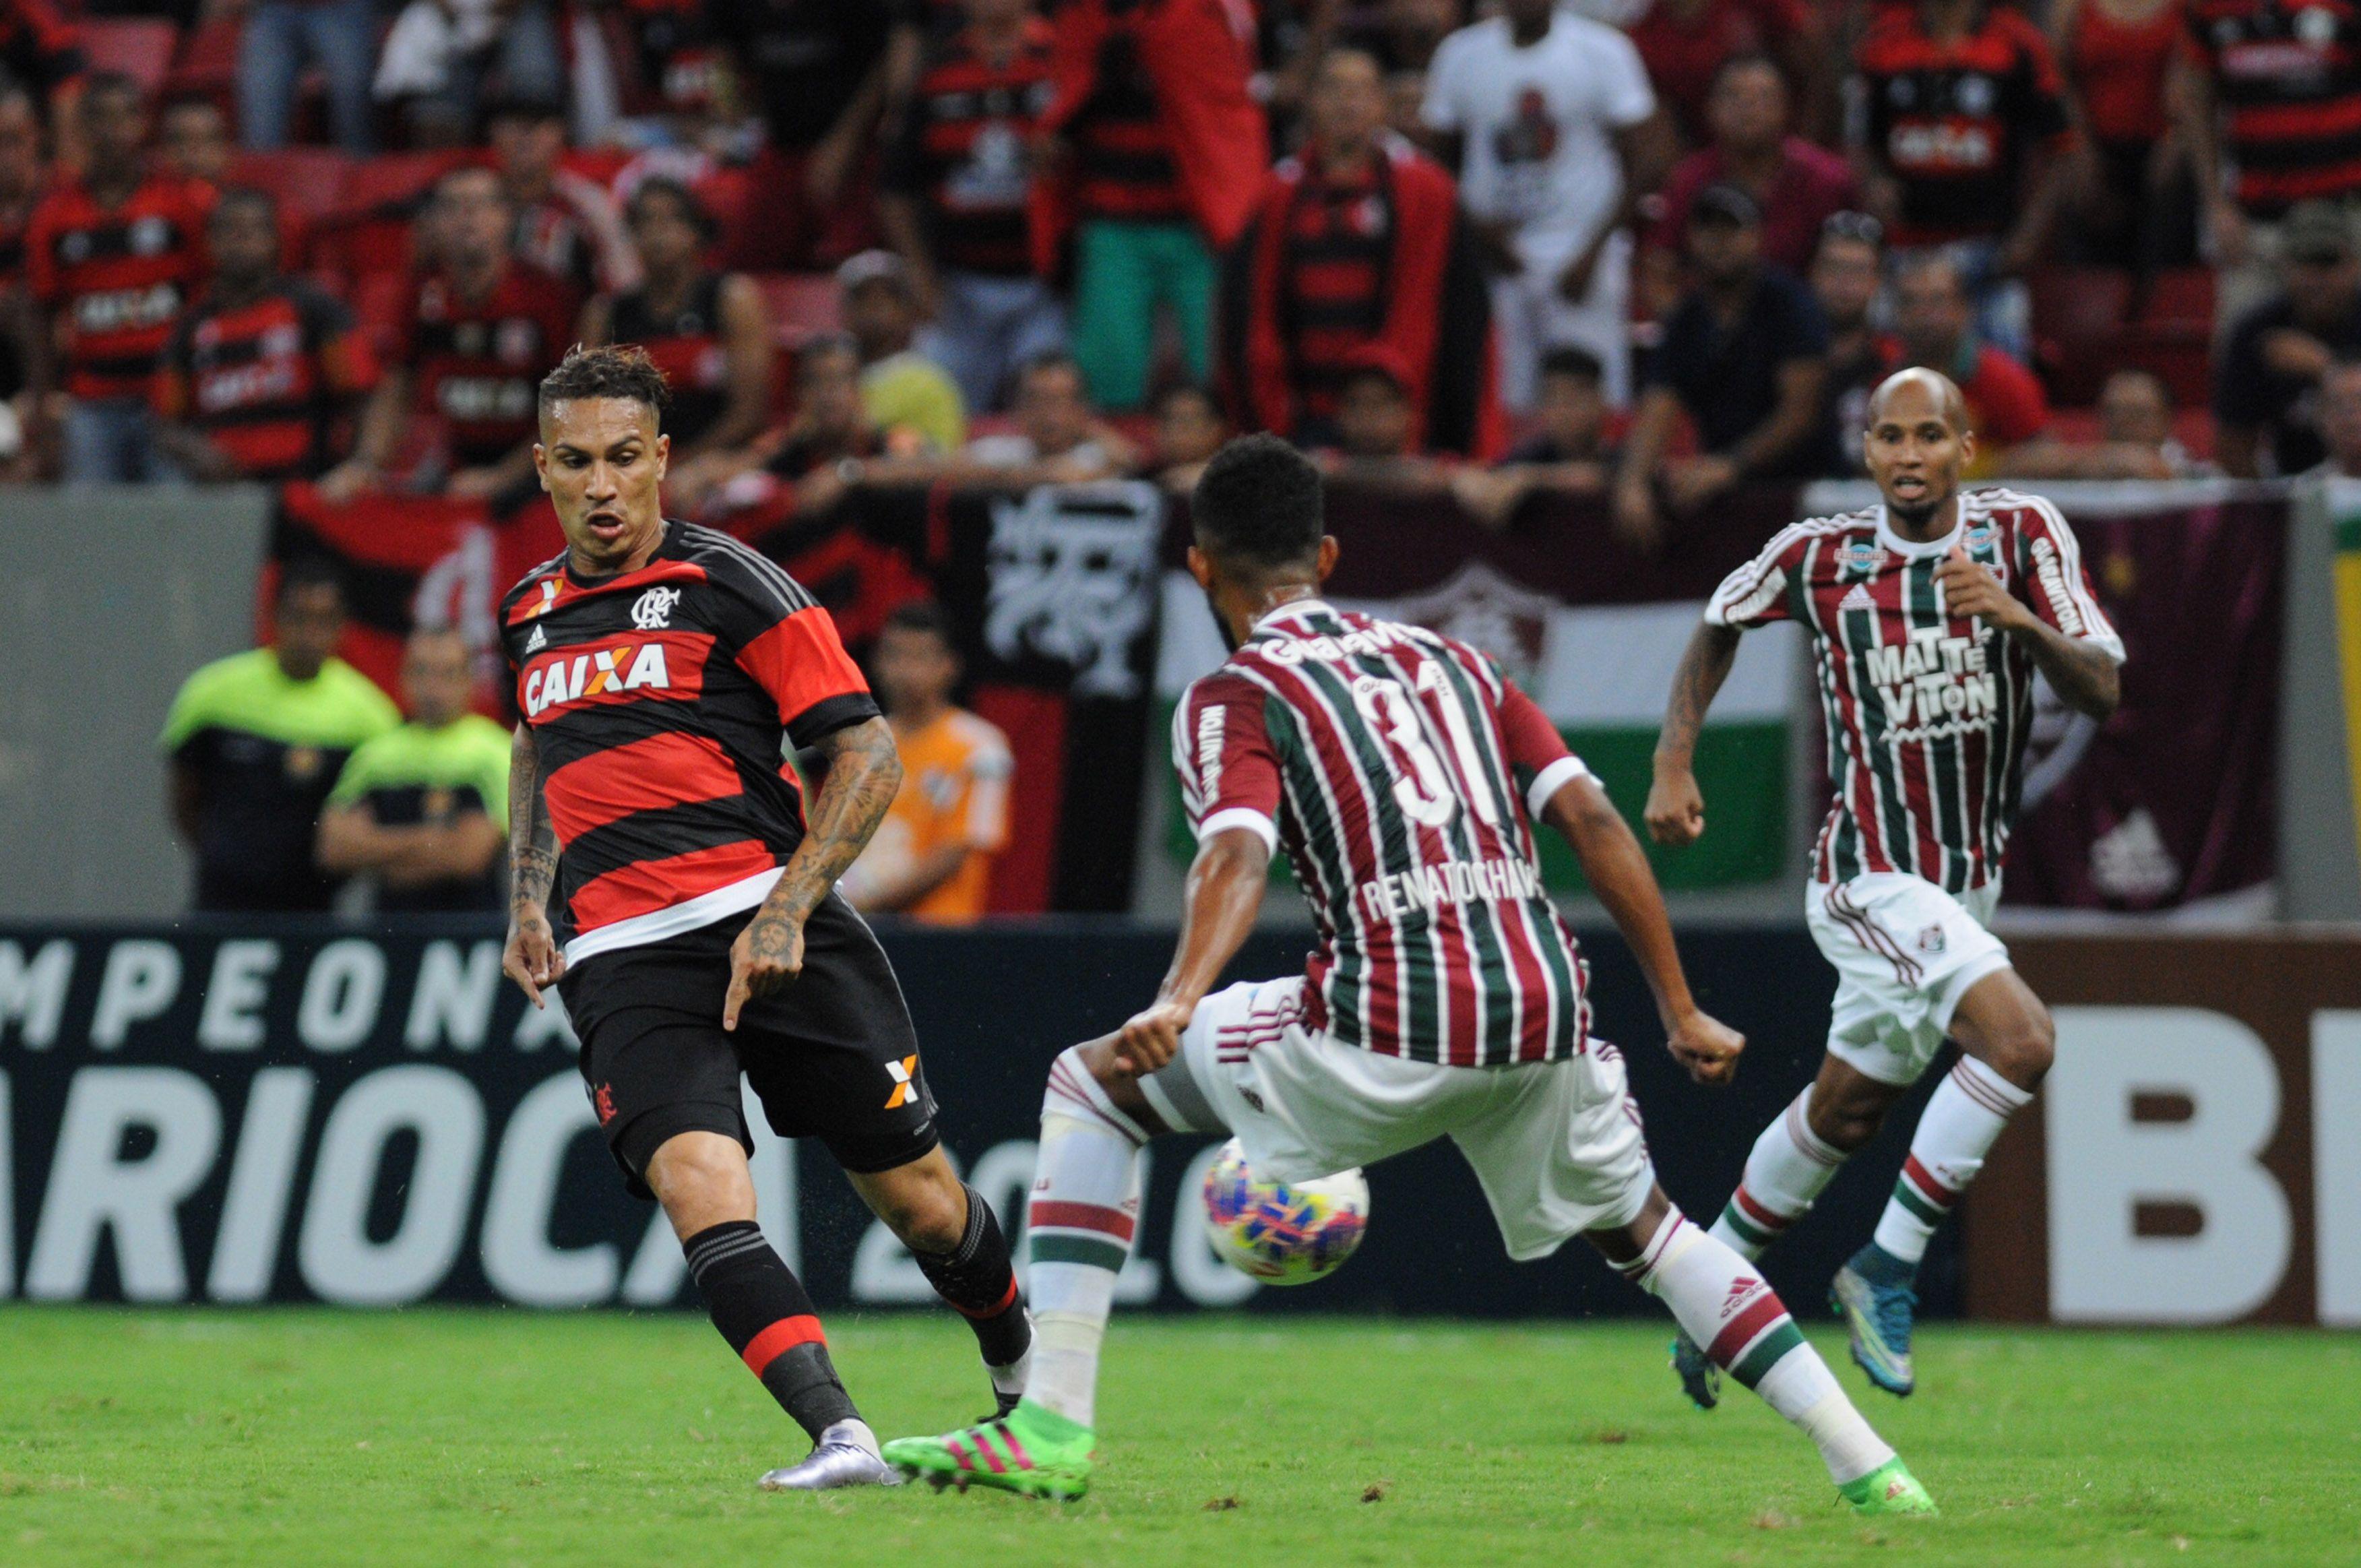 @Flamengo #9ine